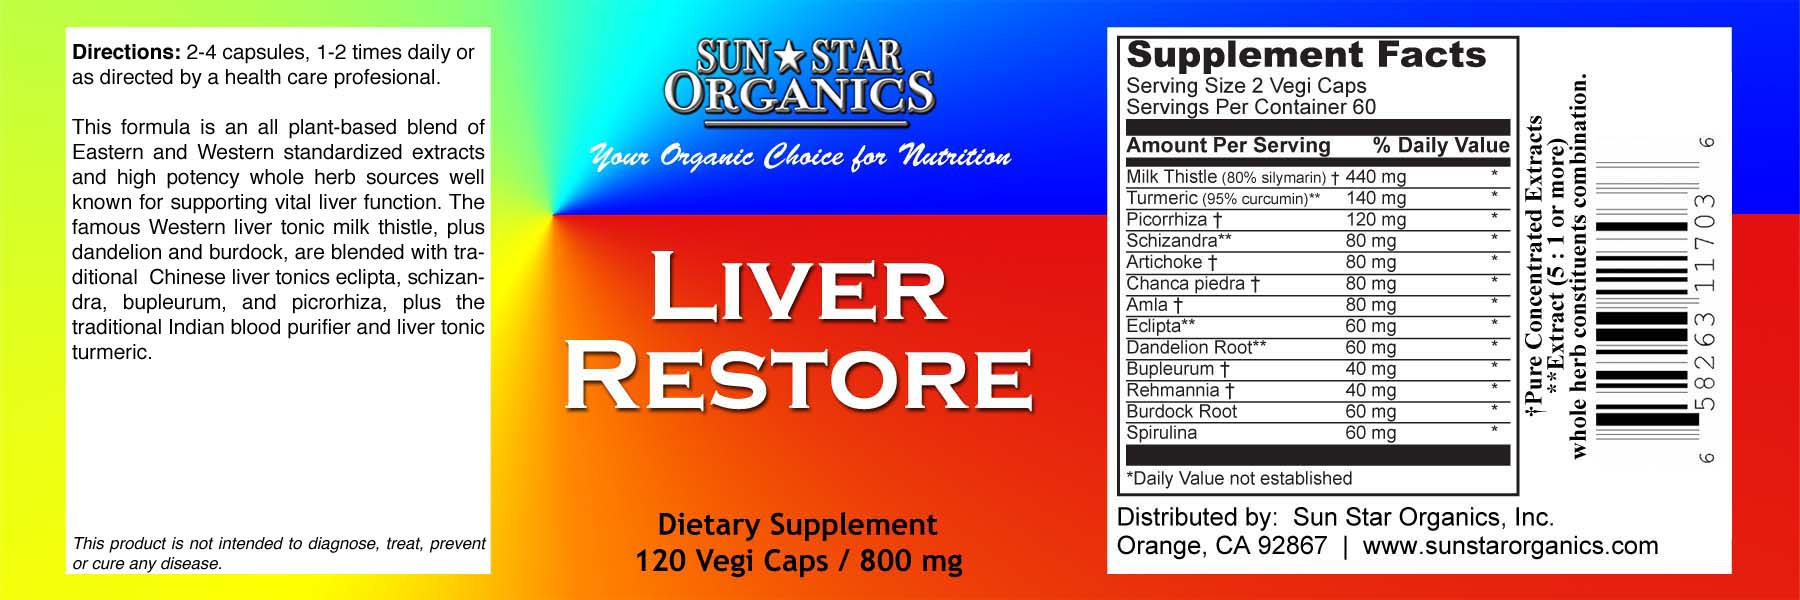 Liver Restore